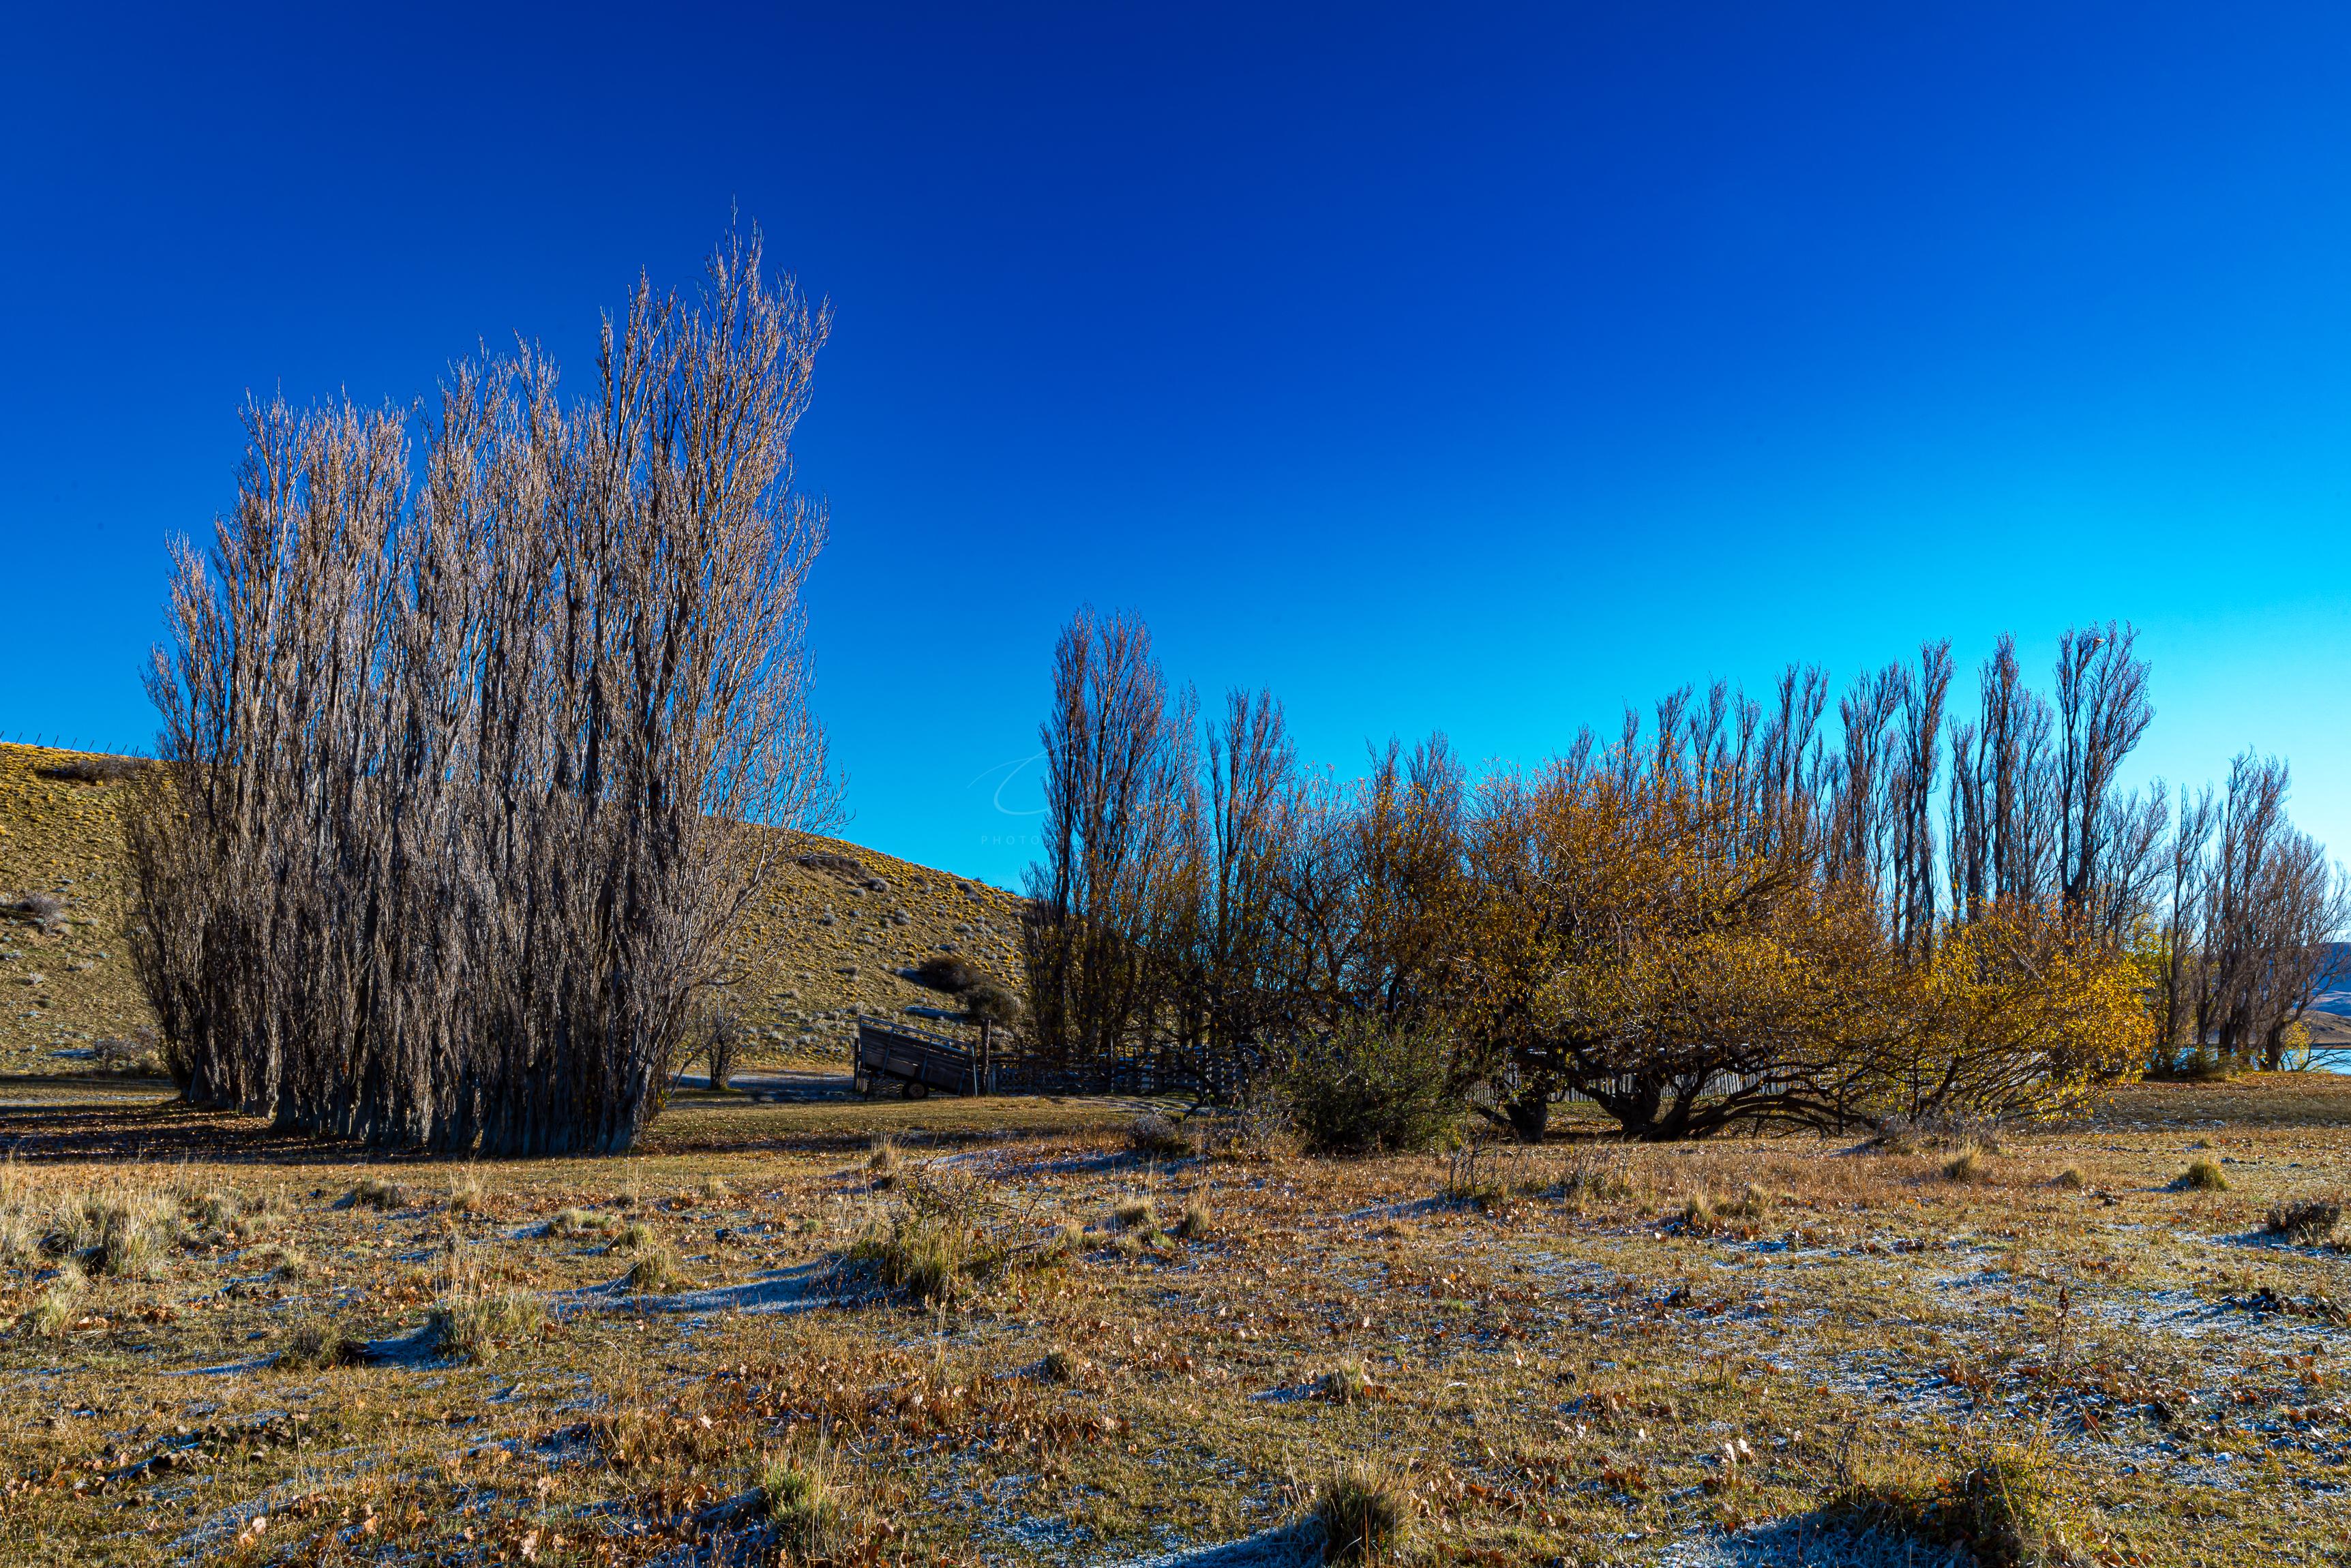 Estancia Patagonica